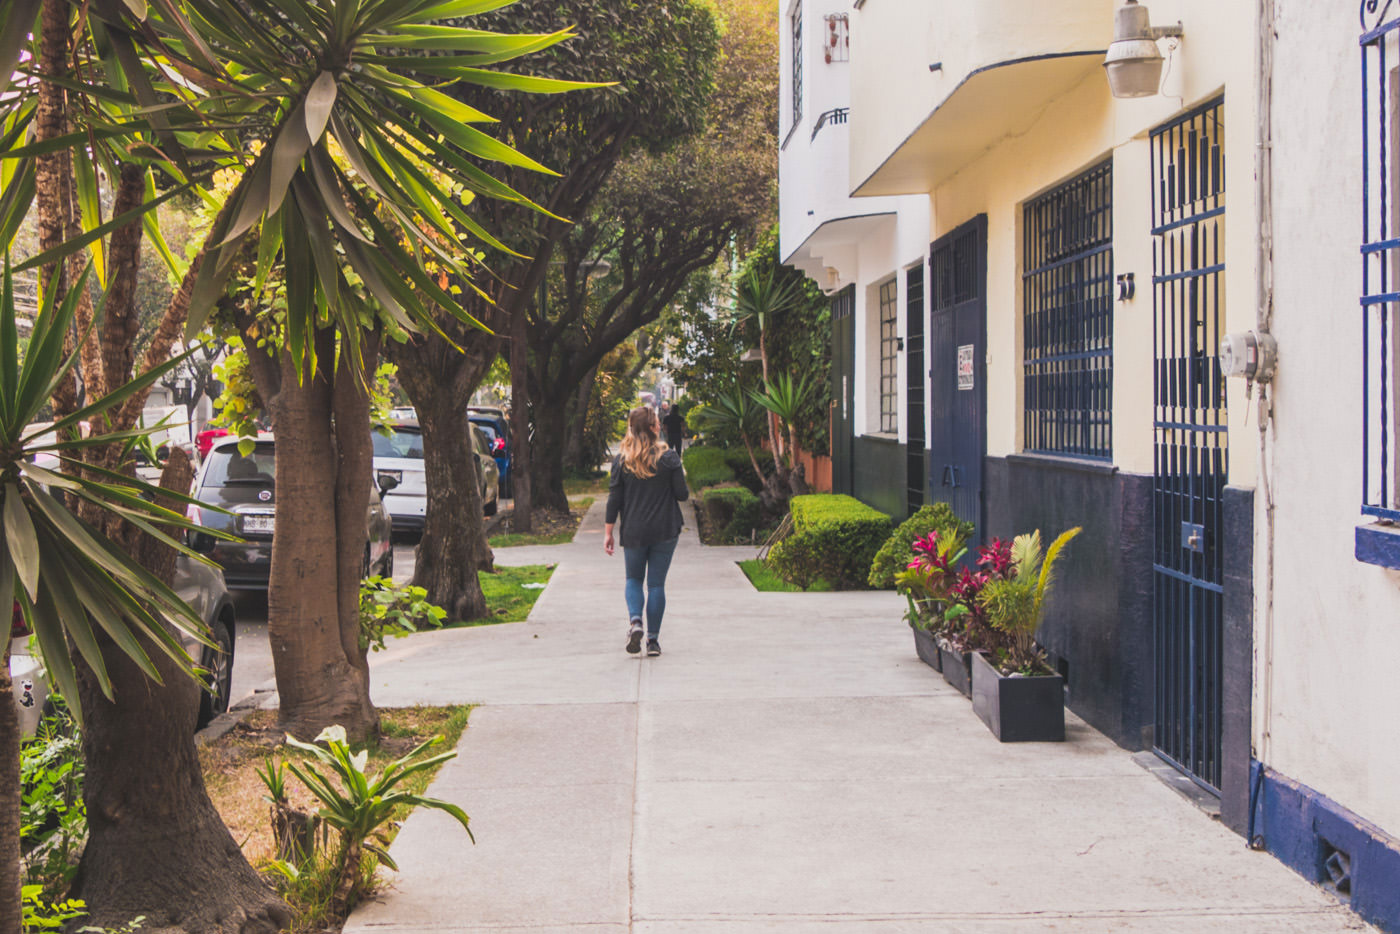 Straße von La Roma in Mexiko-Stadt